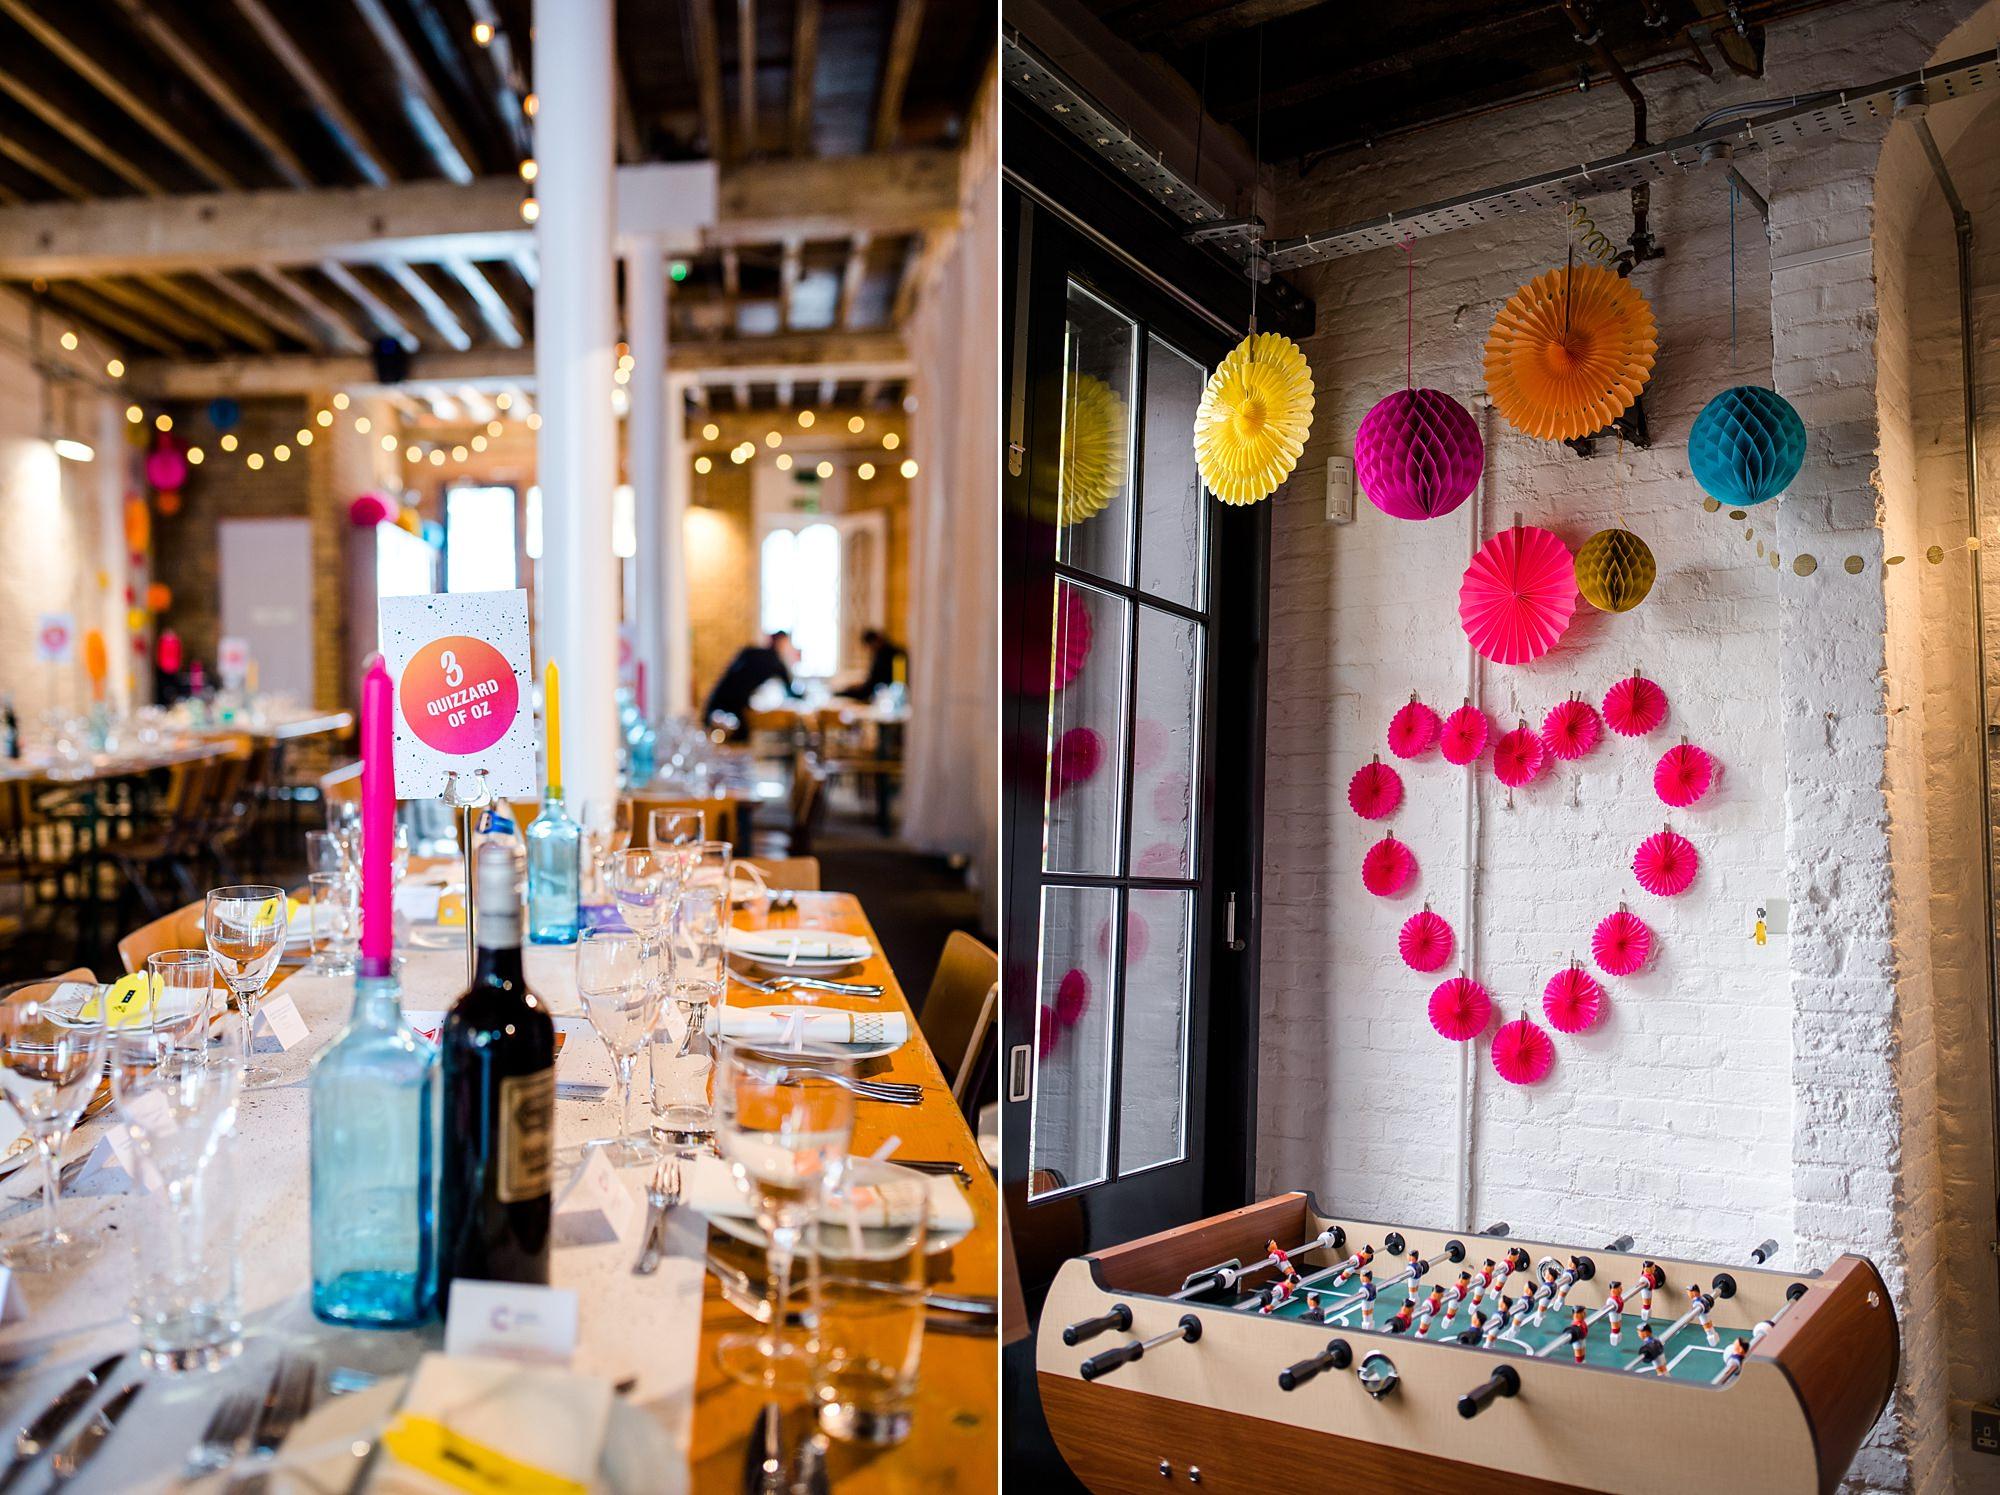 Fun London Wedding bright coloured handmade wall decorations at brixton east